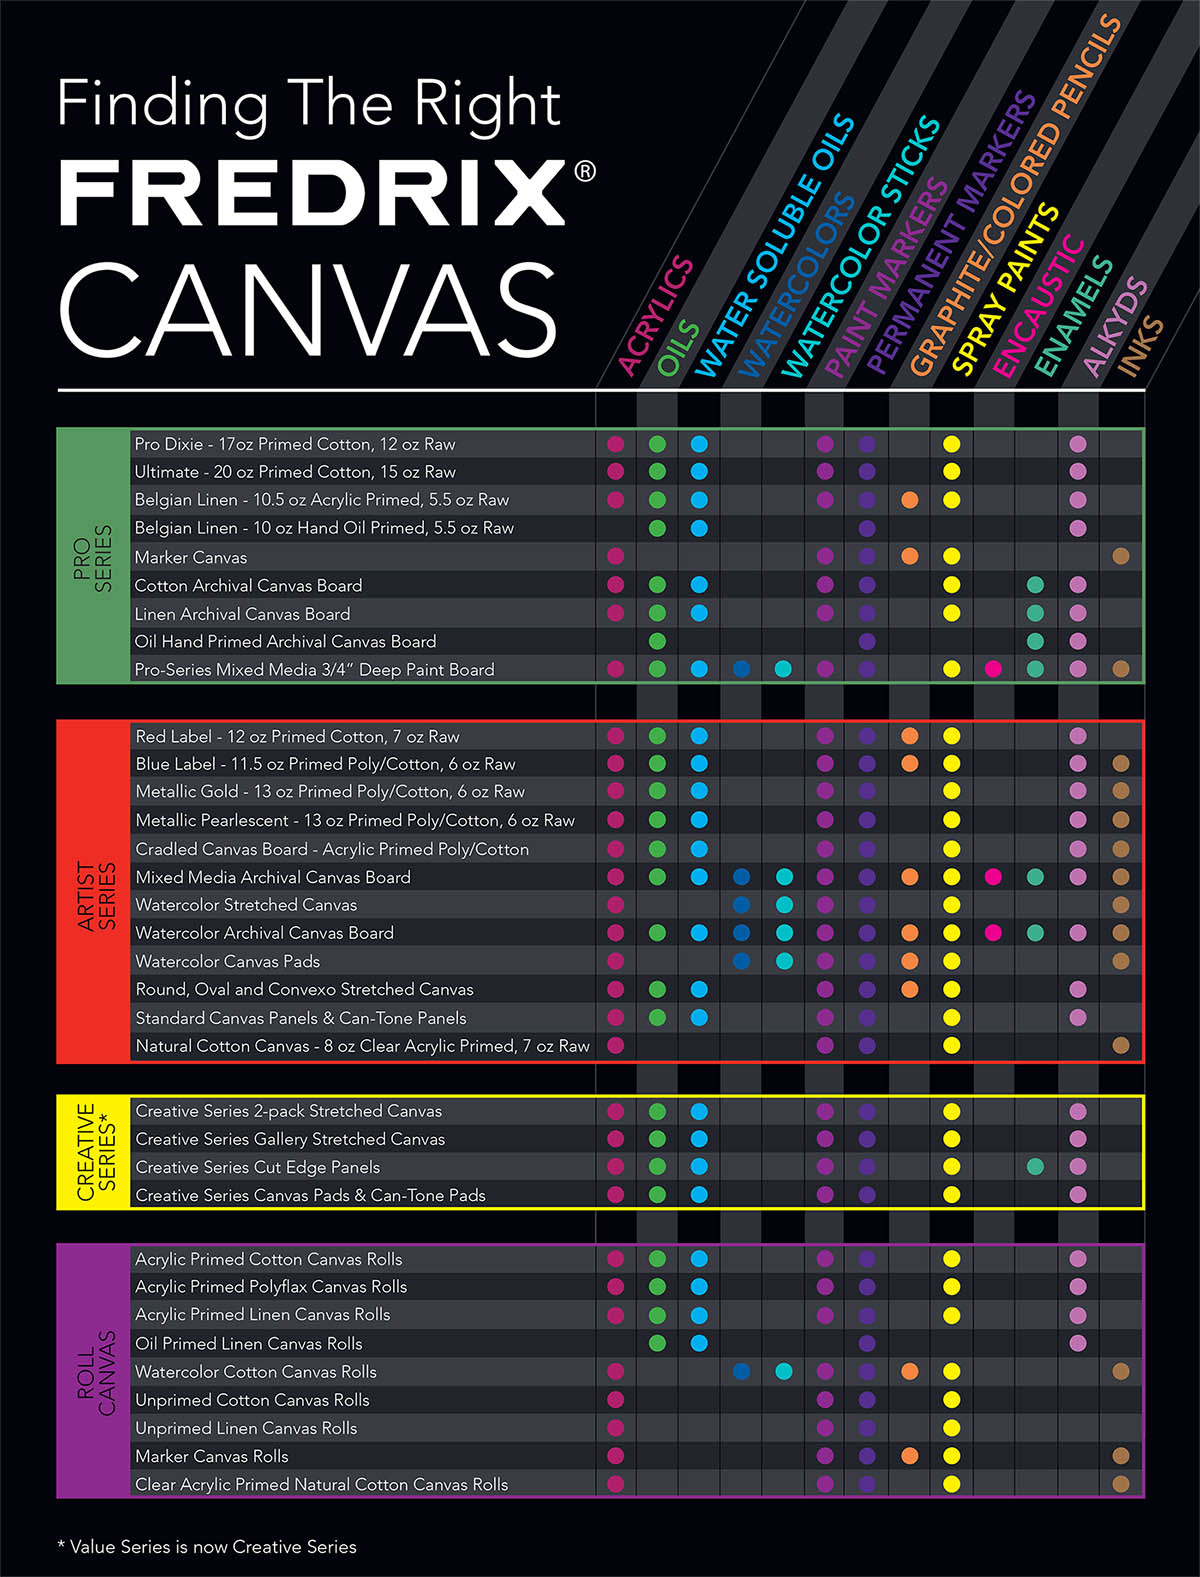 FREDRIX Canvas Guide - FINAL